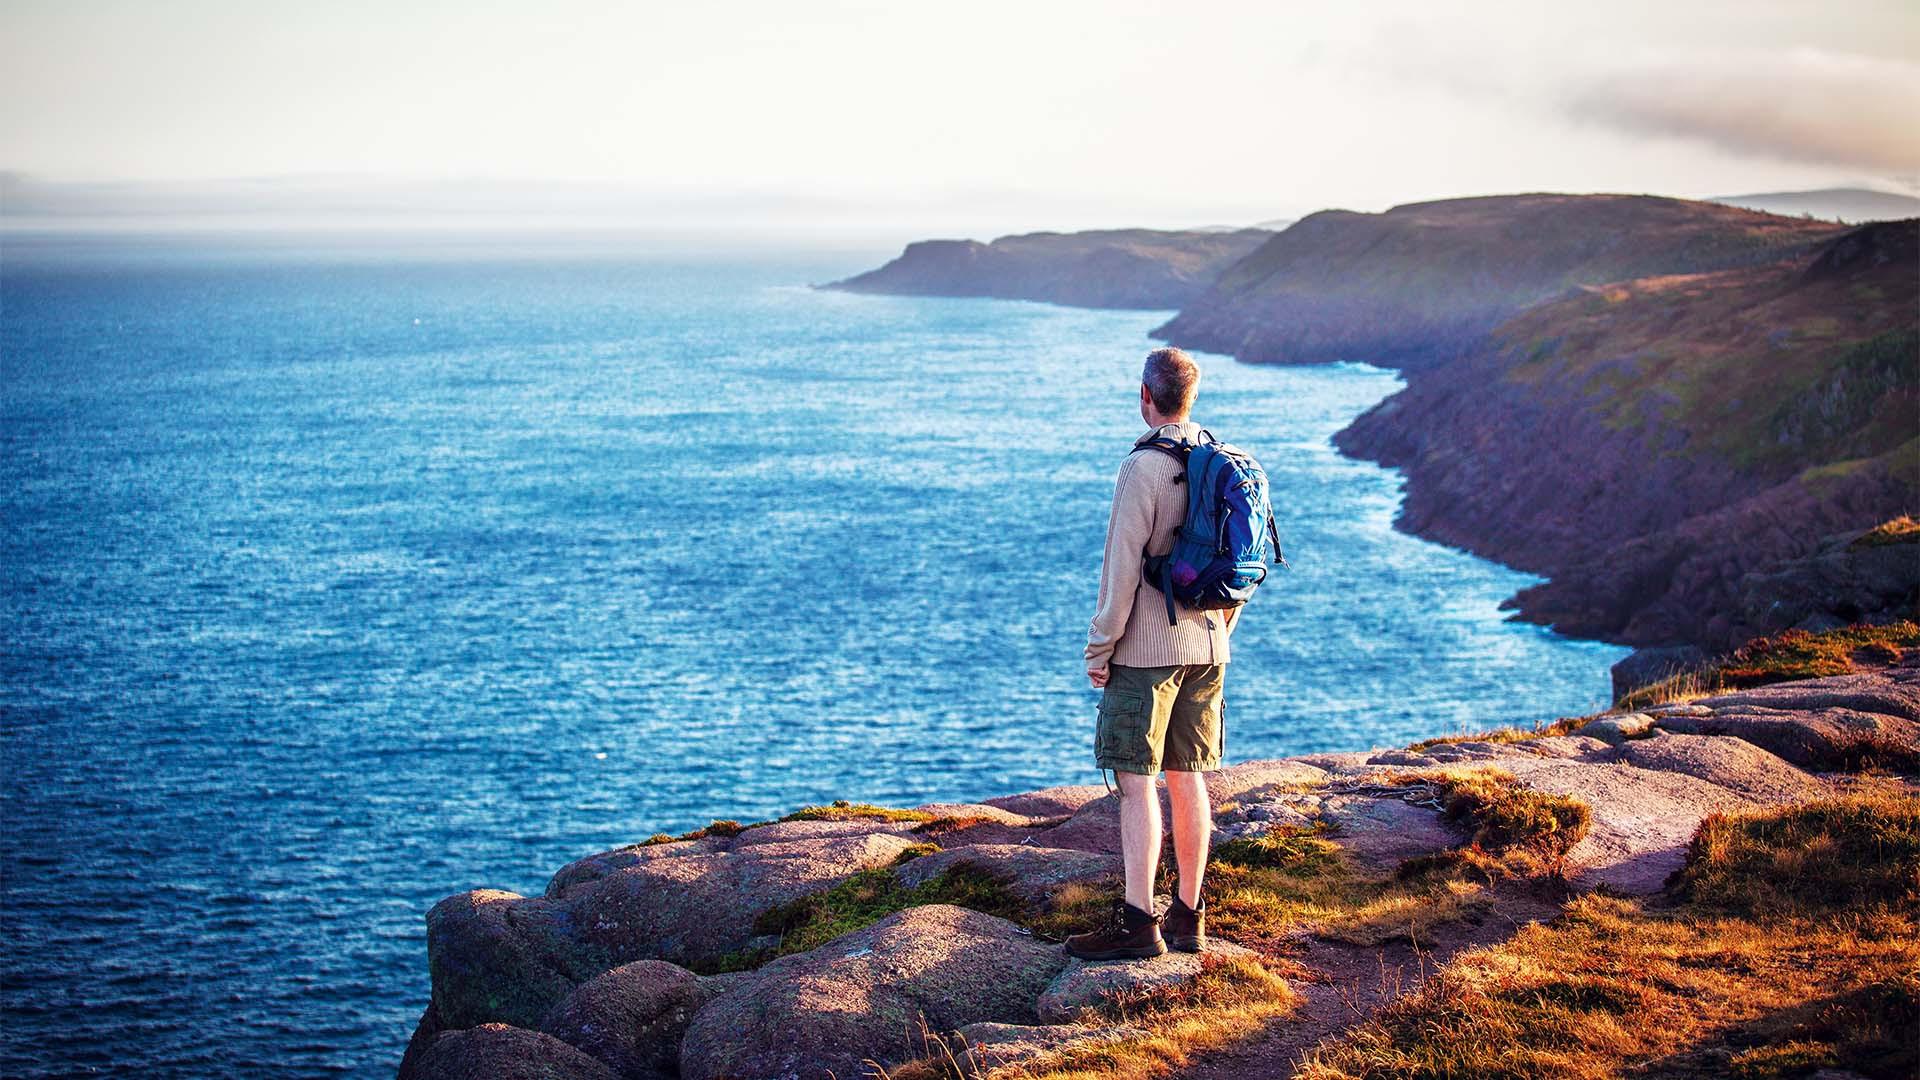 Hiking East Coast Trail, Newfoundland & Labrador, Canada